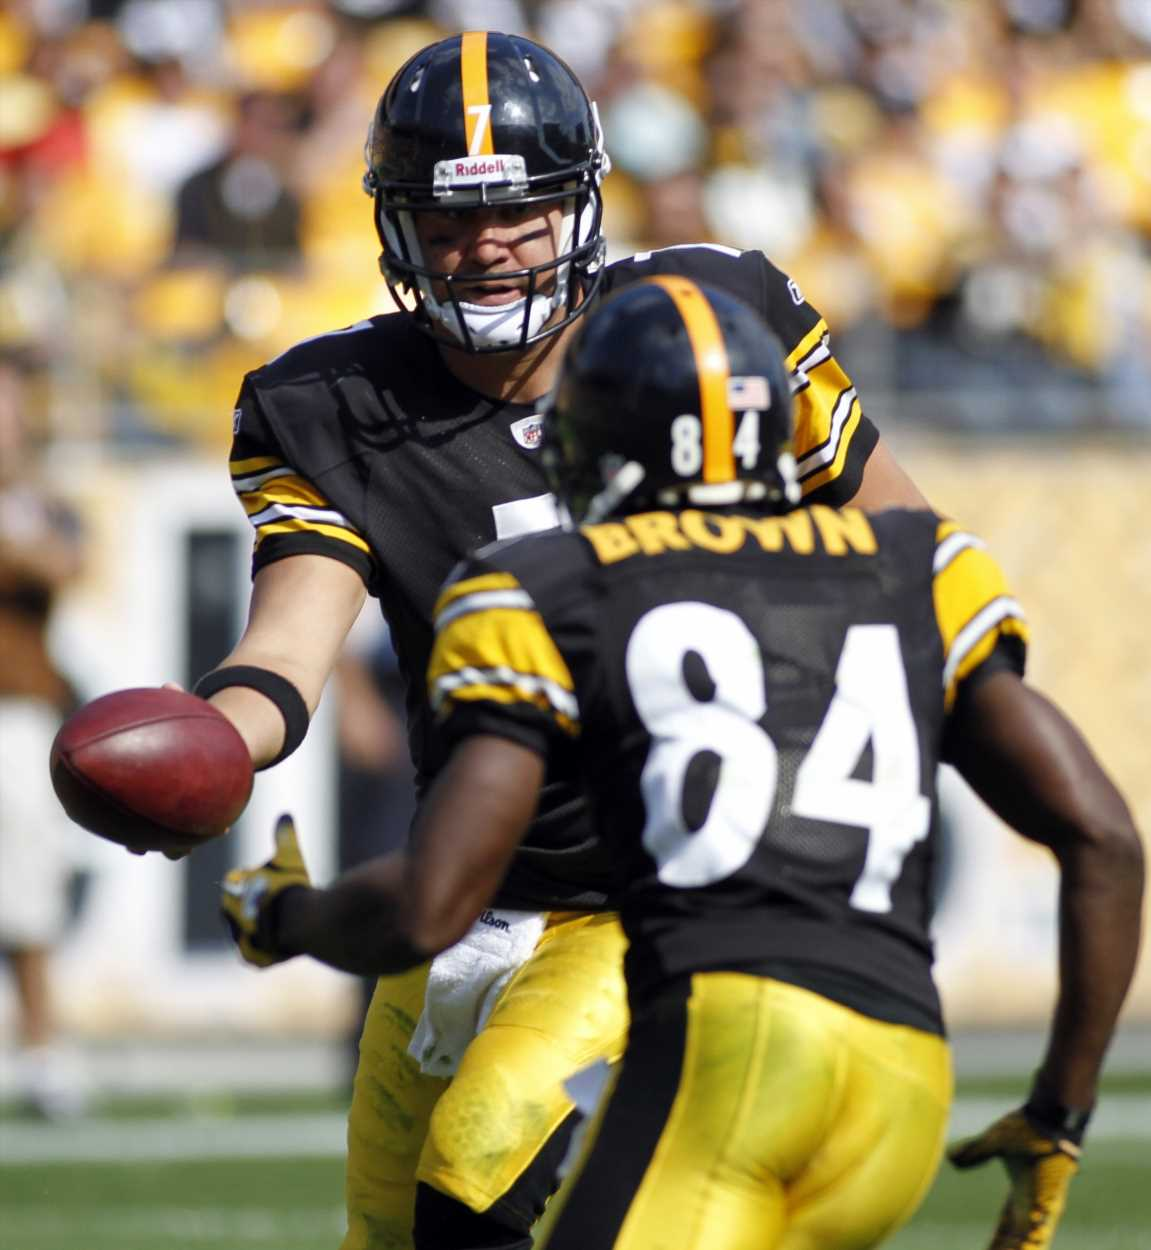 AWOL in Week 17, Steelers beefs, frostbitten feet and helmet drama: An Antonio Brown timeline